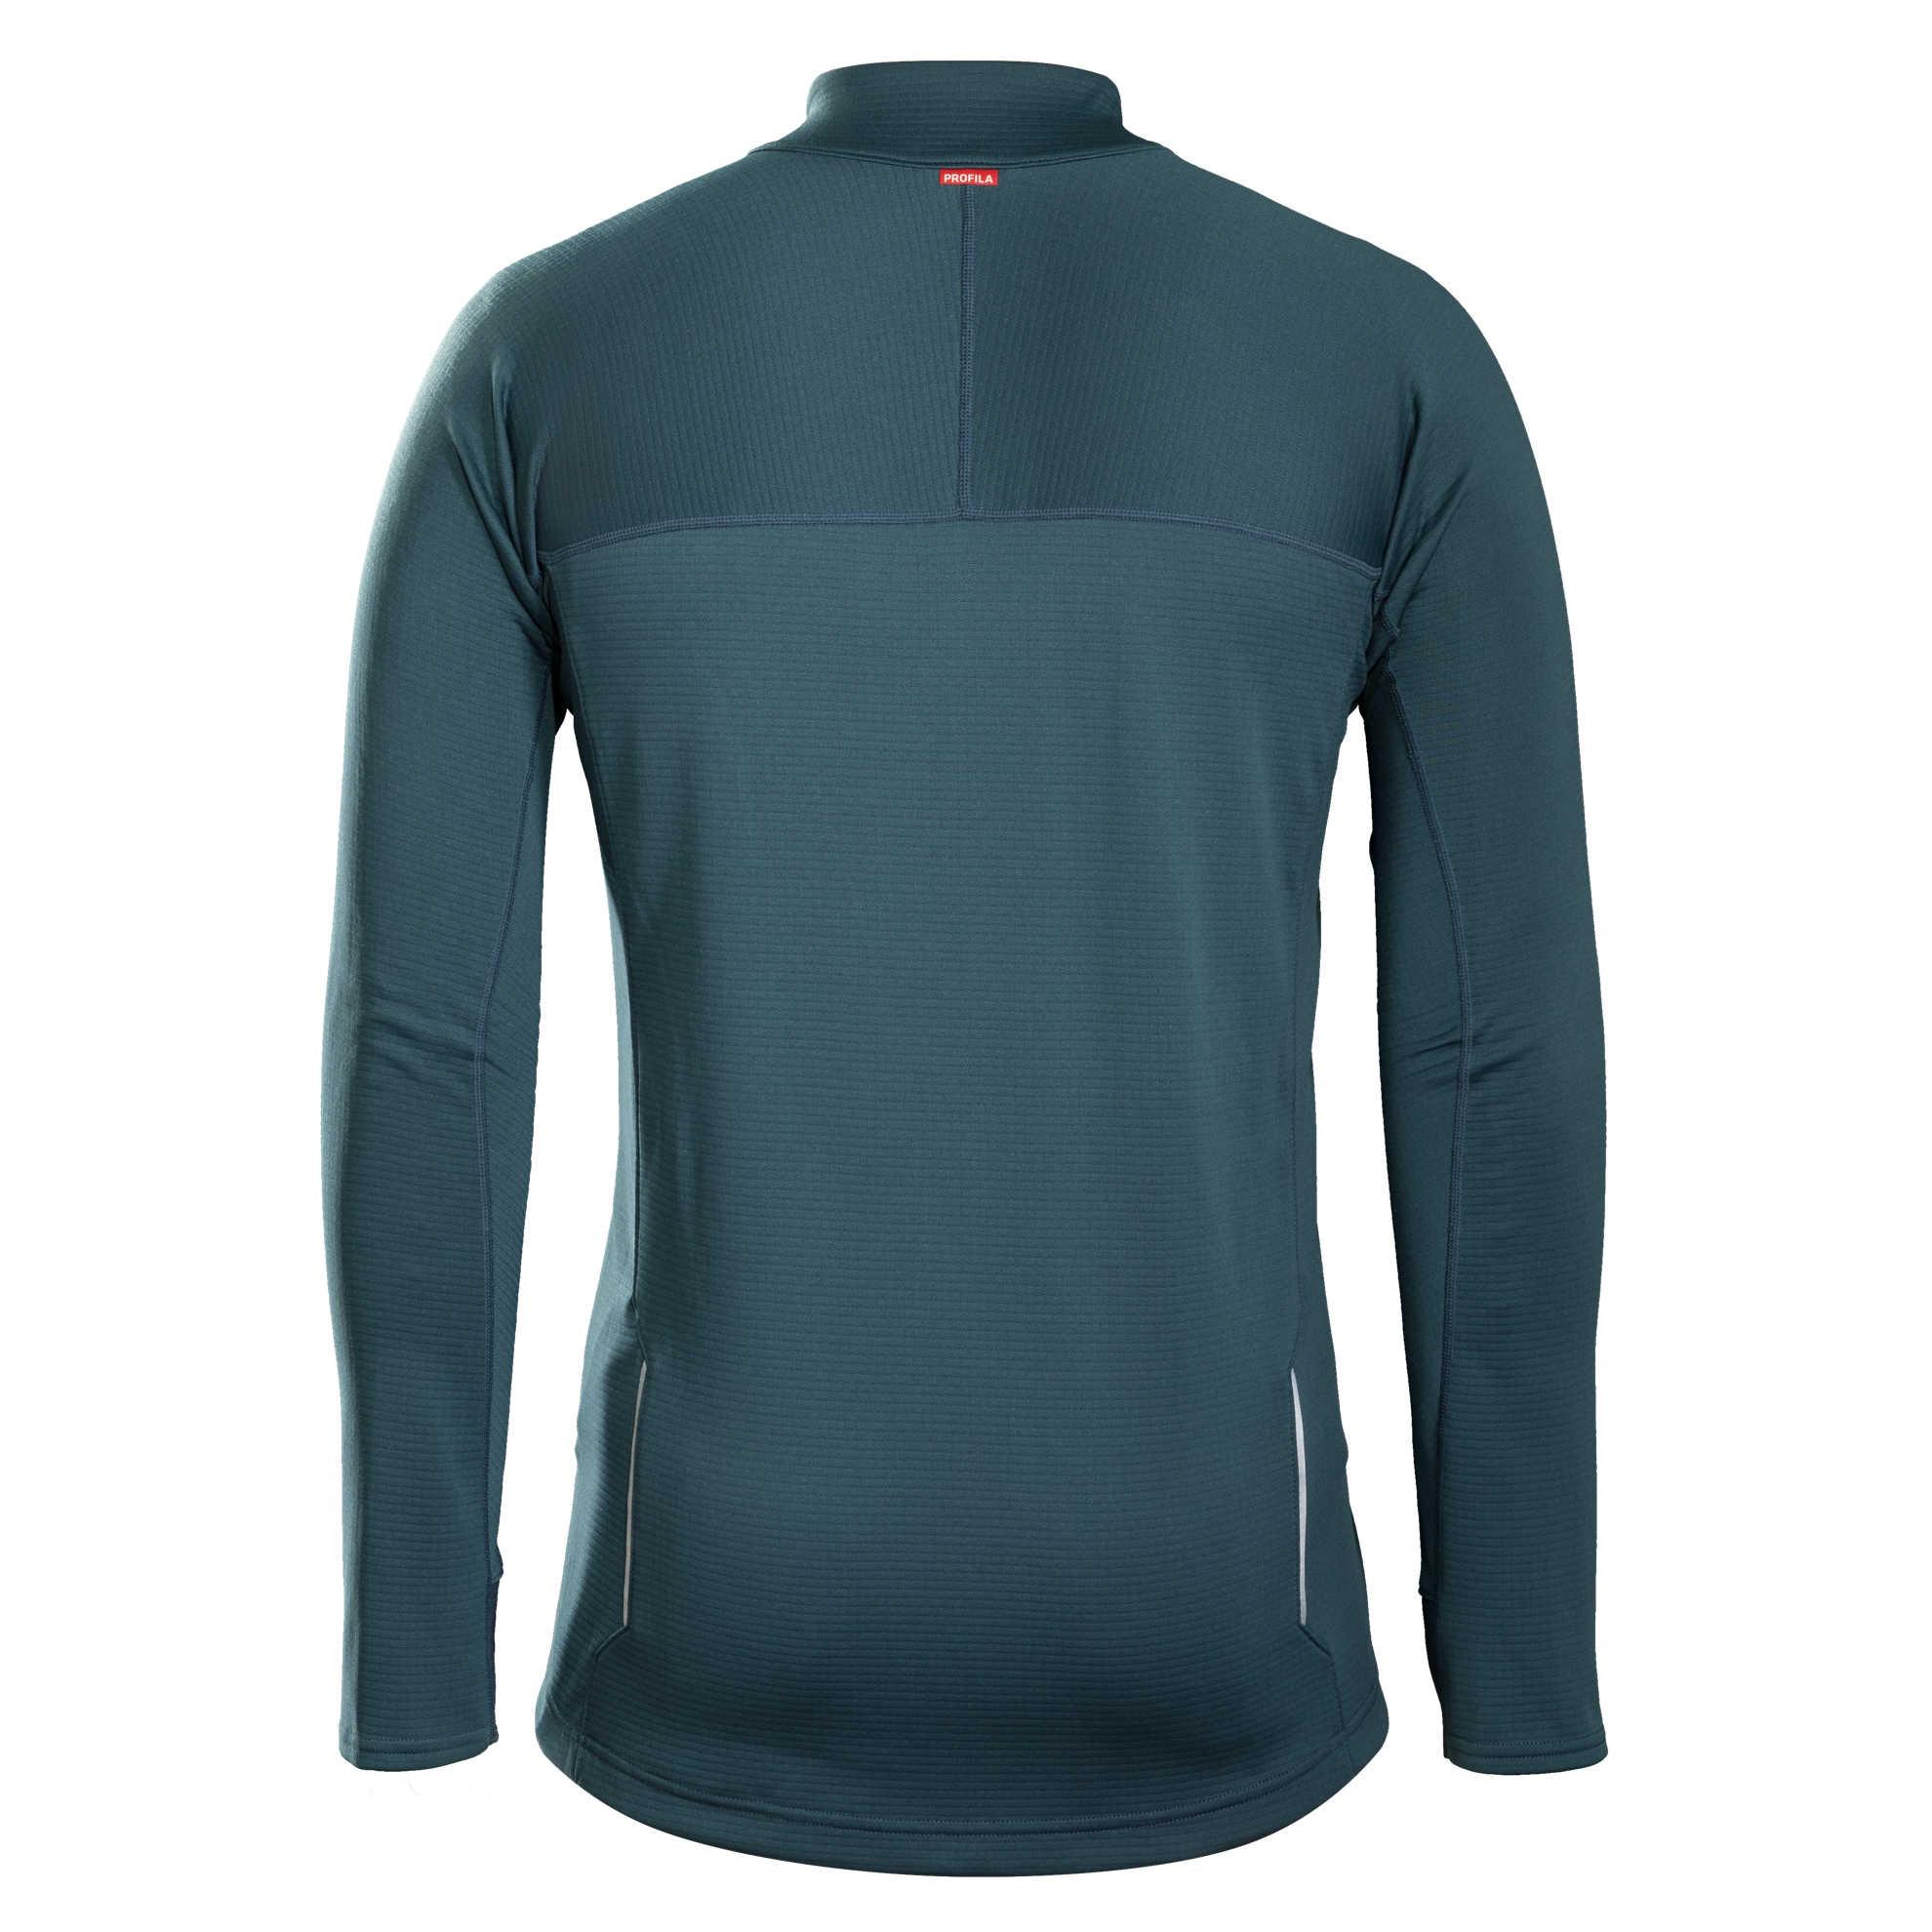 ad8b4d95a00 Bontrager Evoke Thermal Long Sleeve Cycling Jersey | Trek Bikes